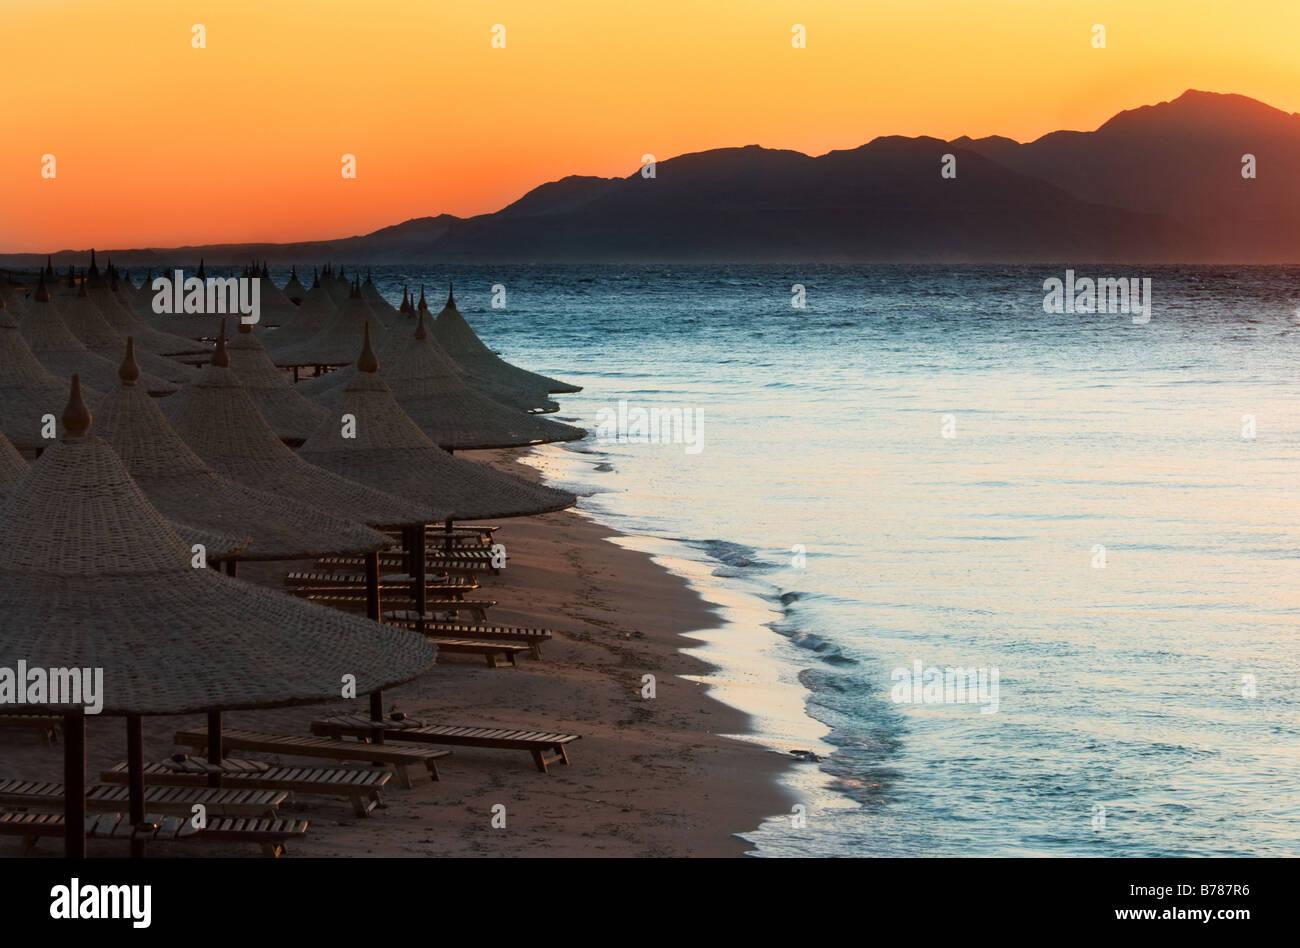 sunrise in sharm el sheikh egypt - Stock Image